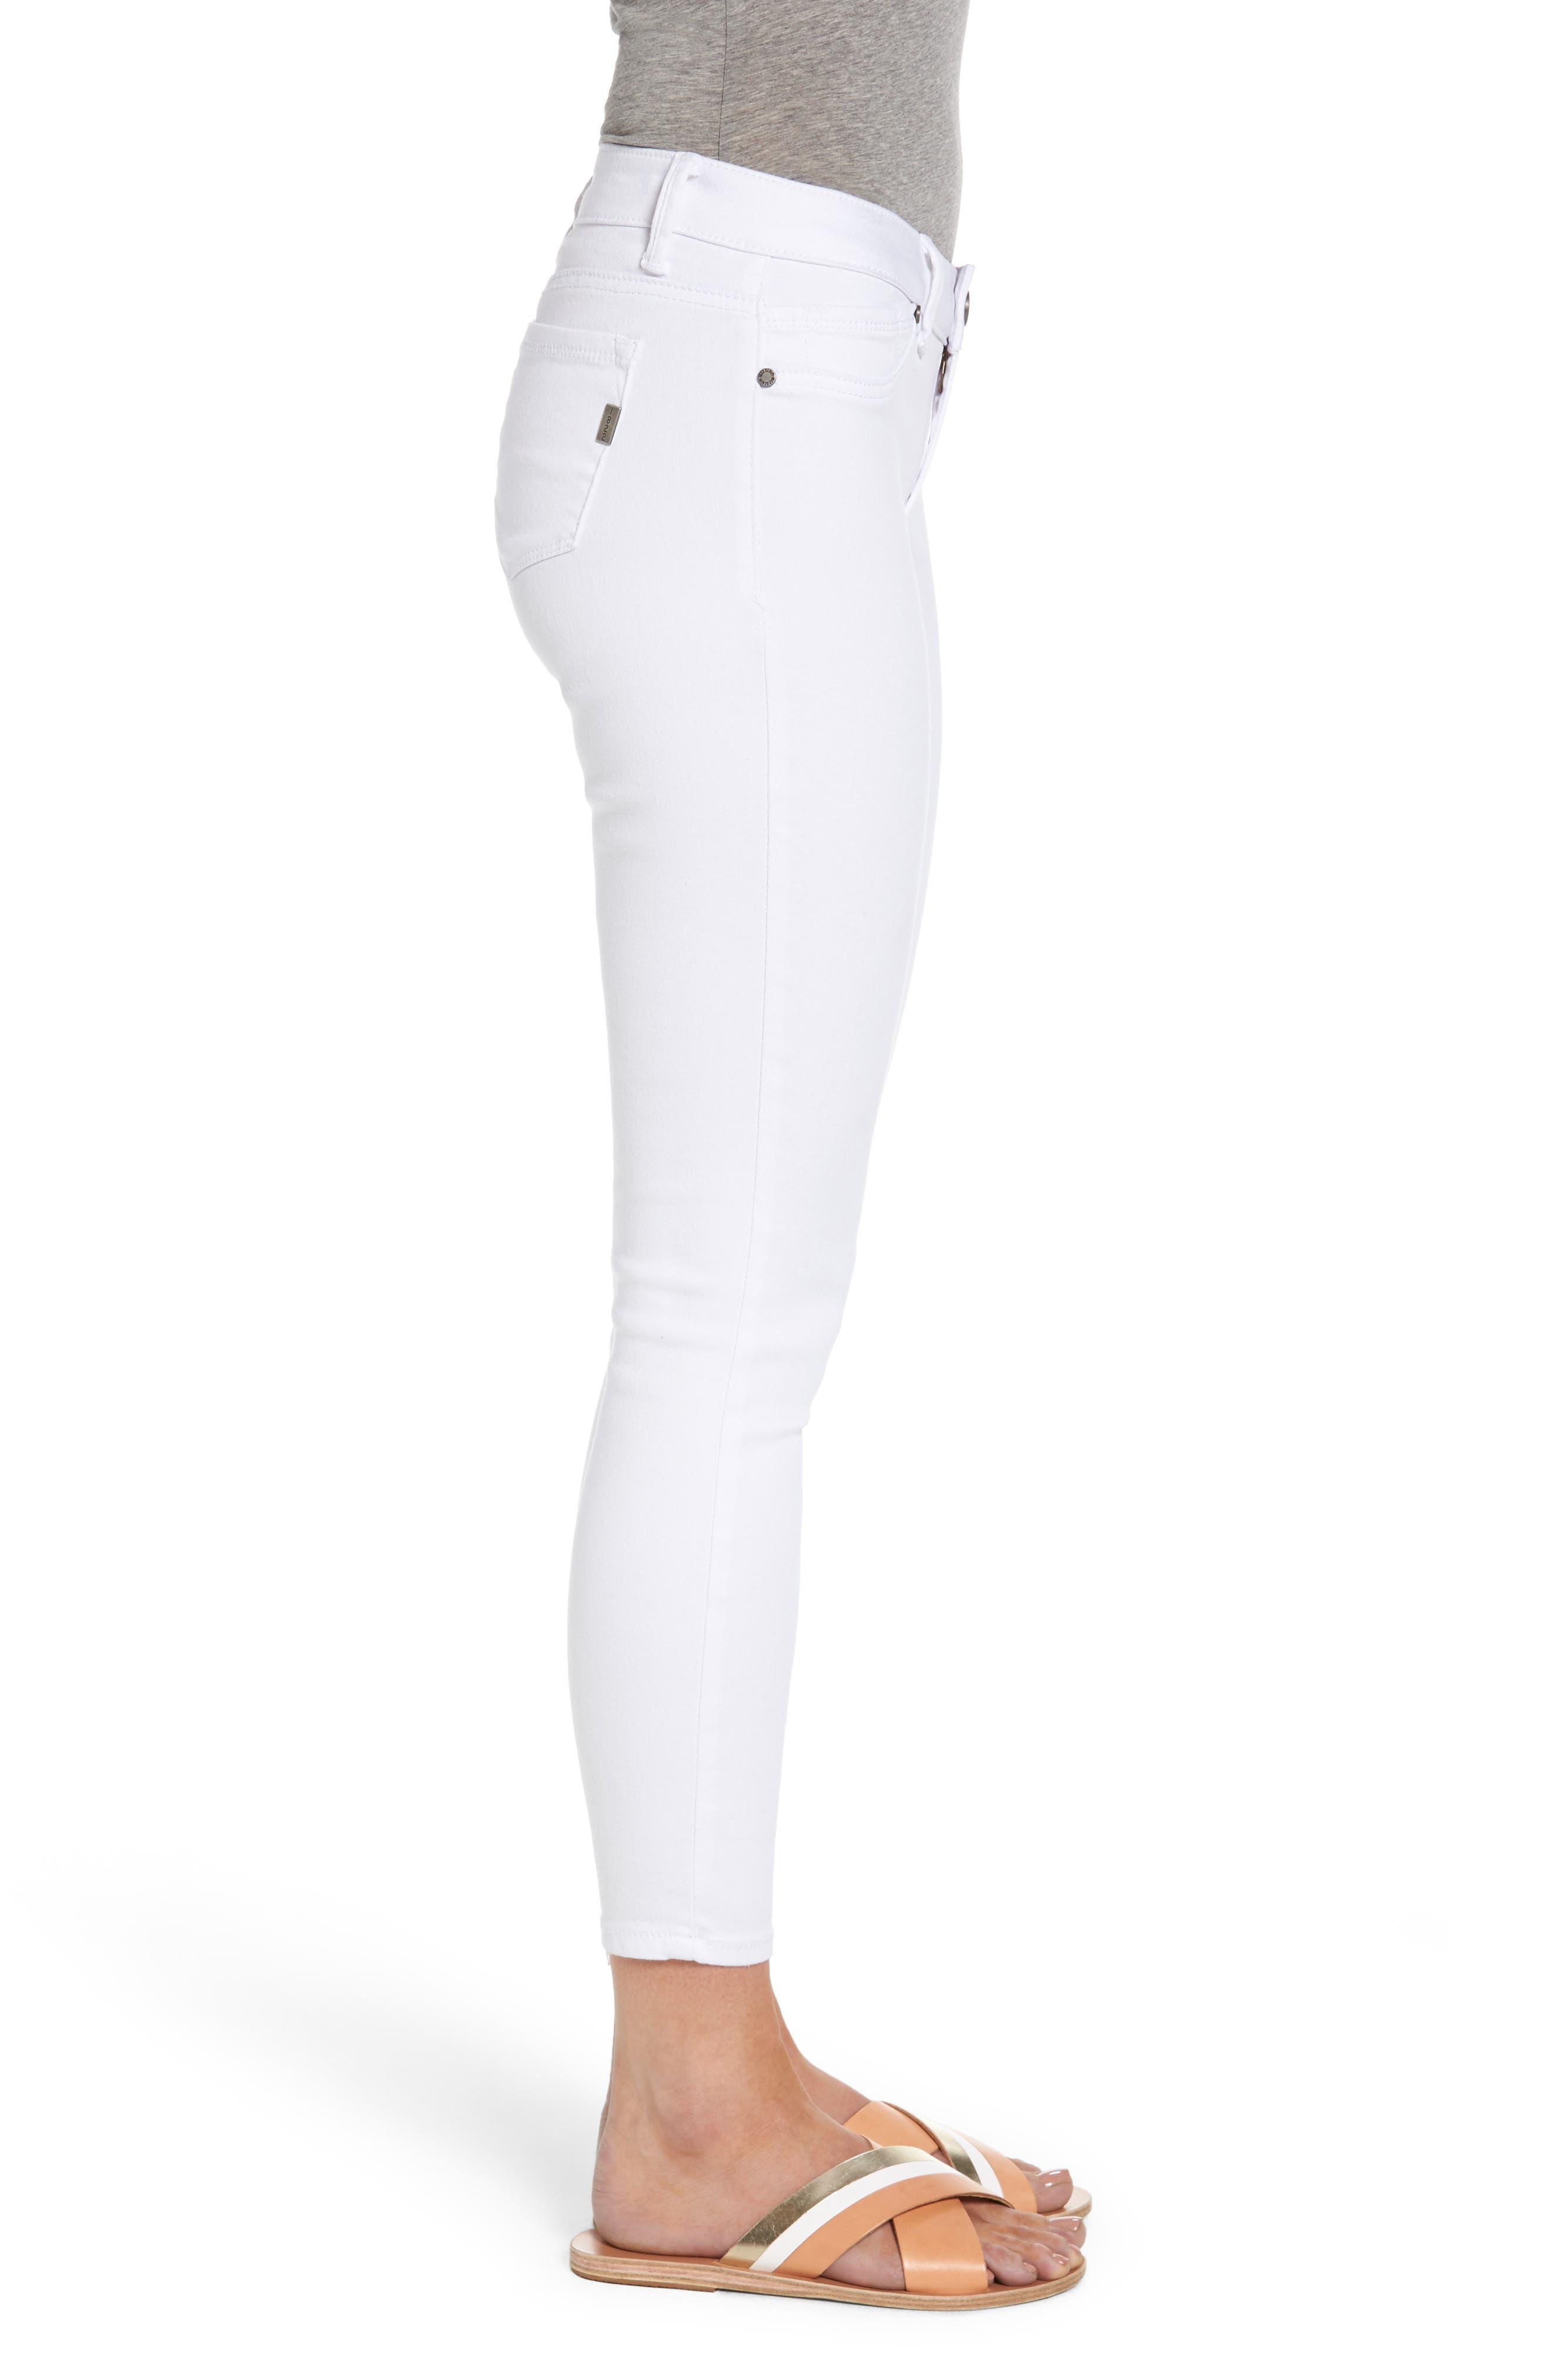 1822 Butter Skinny Jeans,                             Alternate thumbnail 3, color,                             Wht